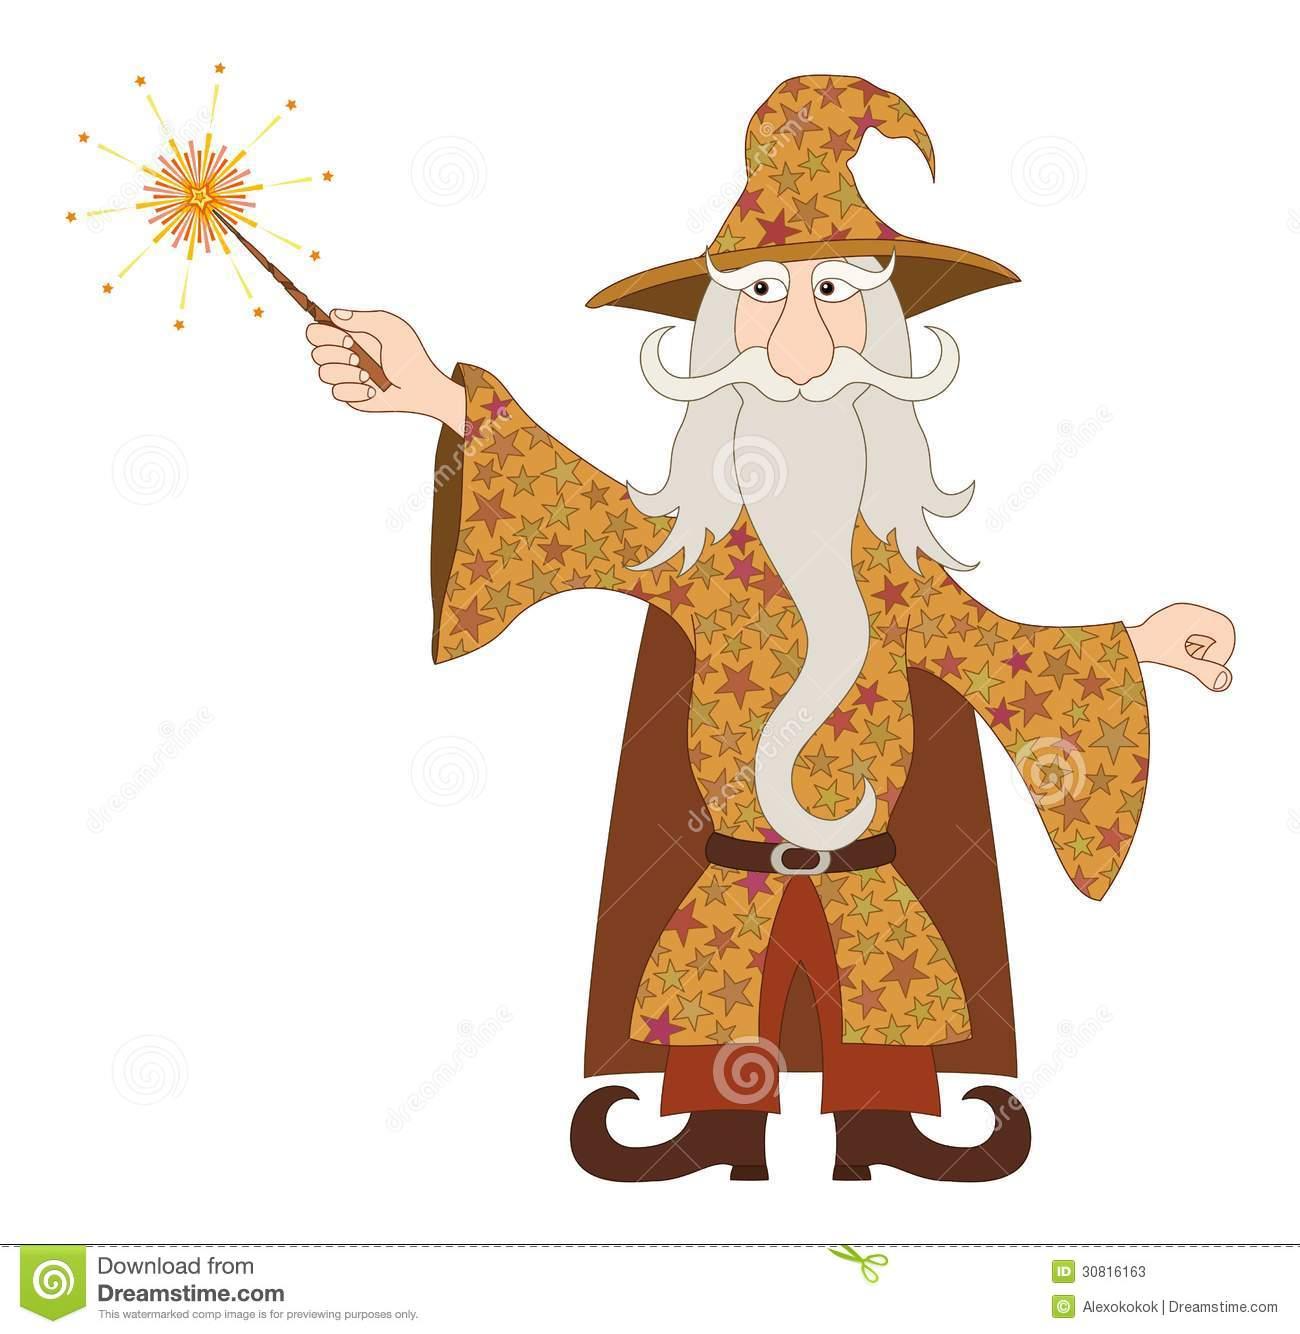 Gandalf clipart #17, Download drawings